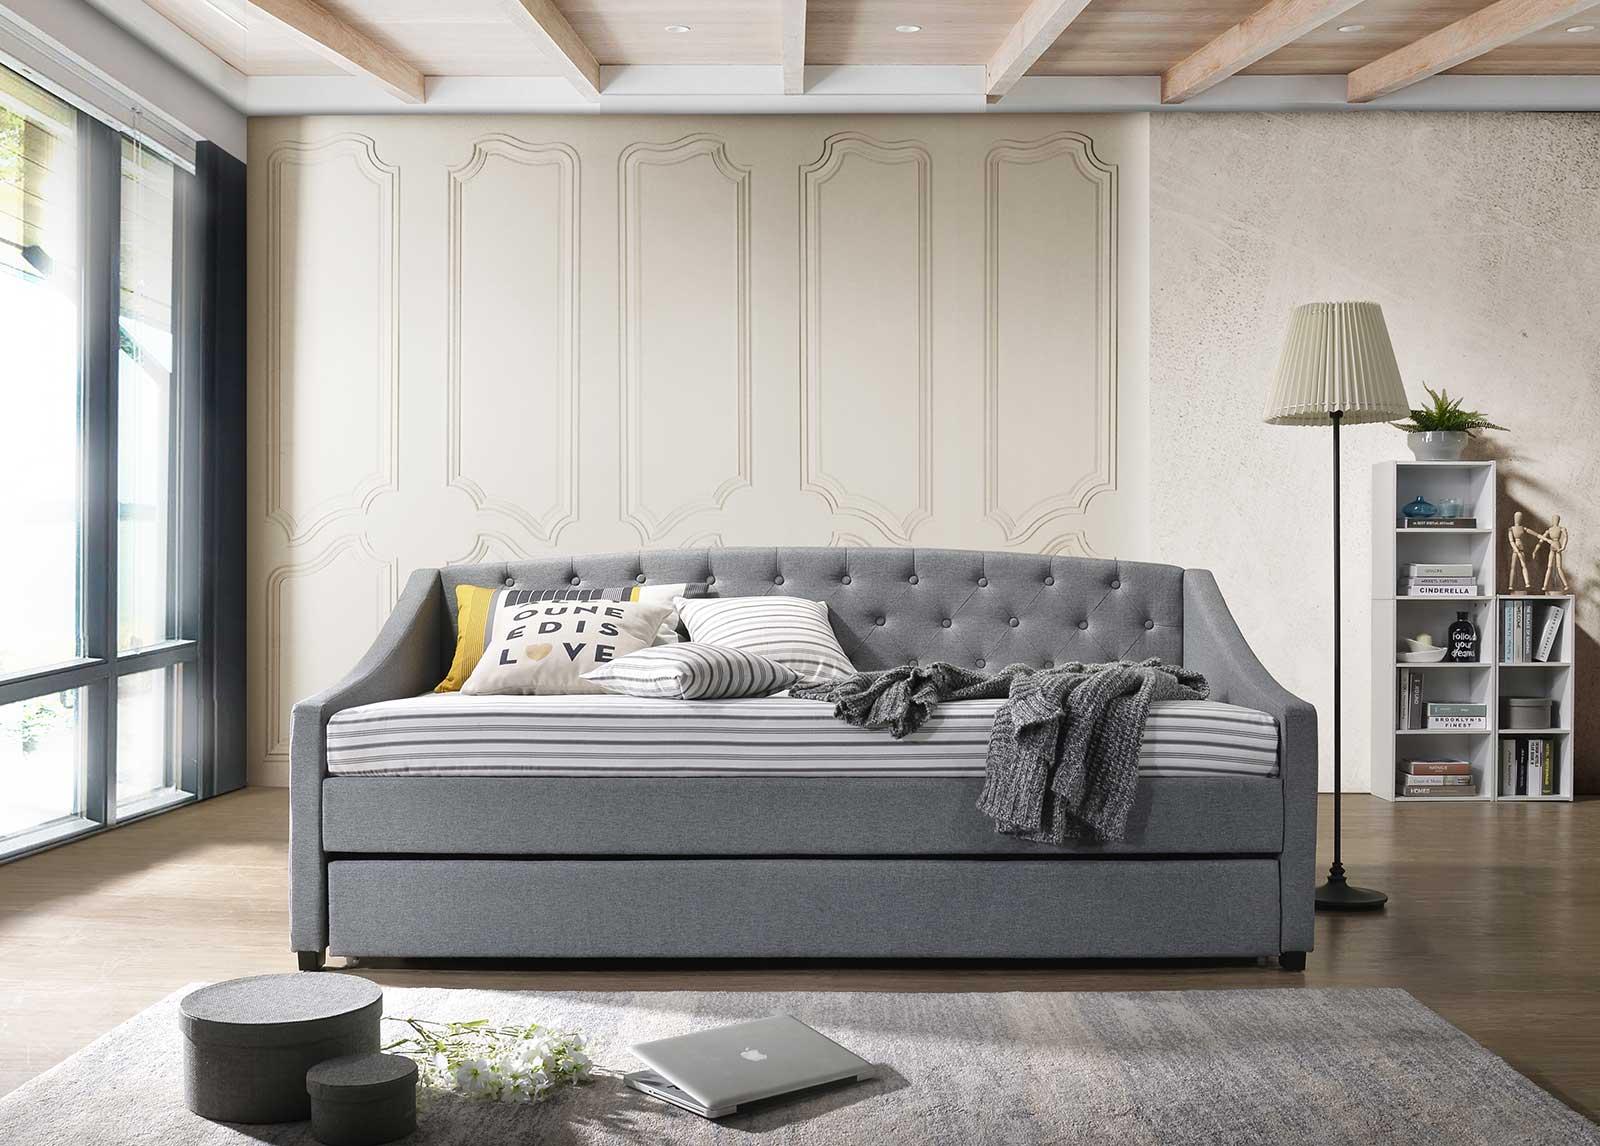 Olsen Daybed Trundle Buy Online Australia Timeless Elegant Spacious